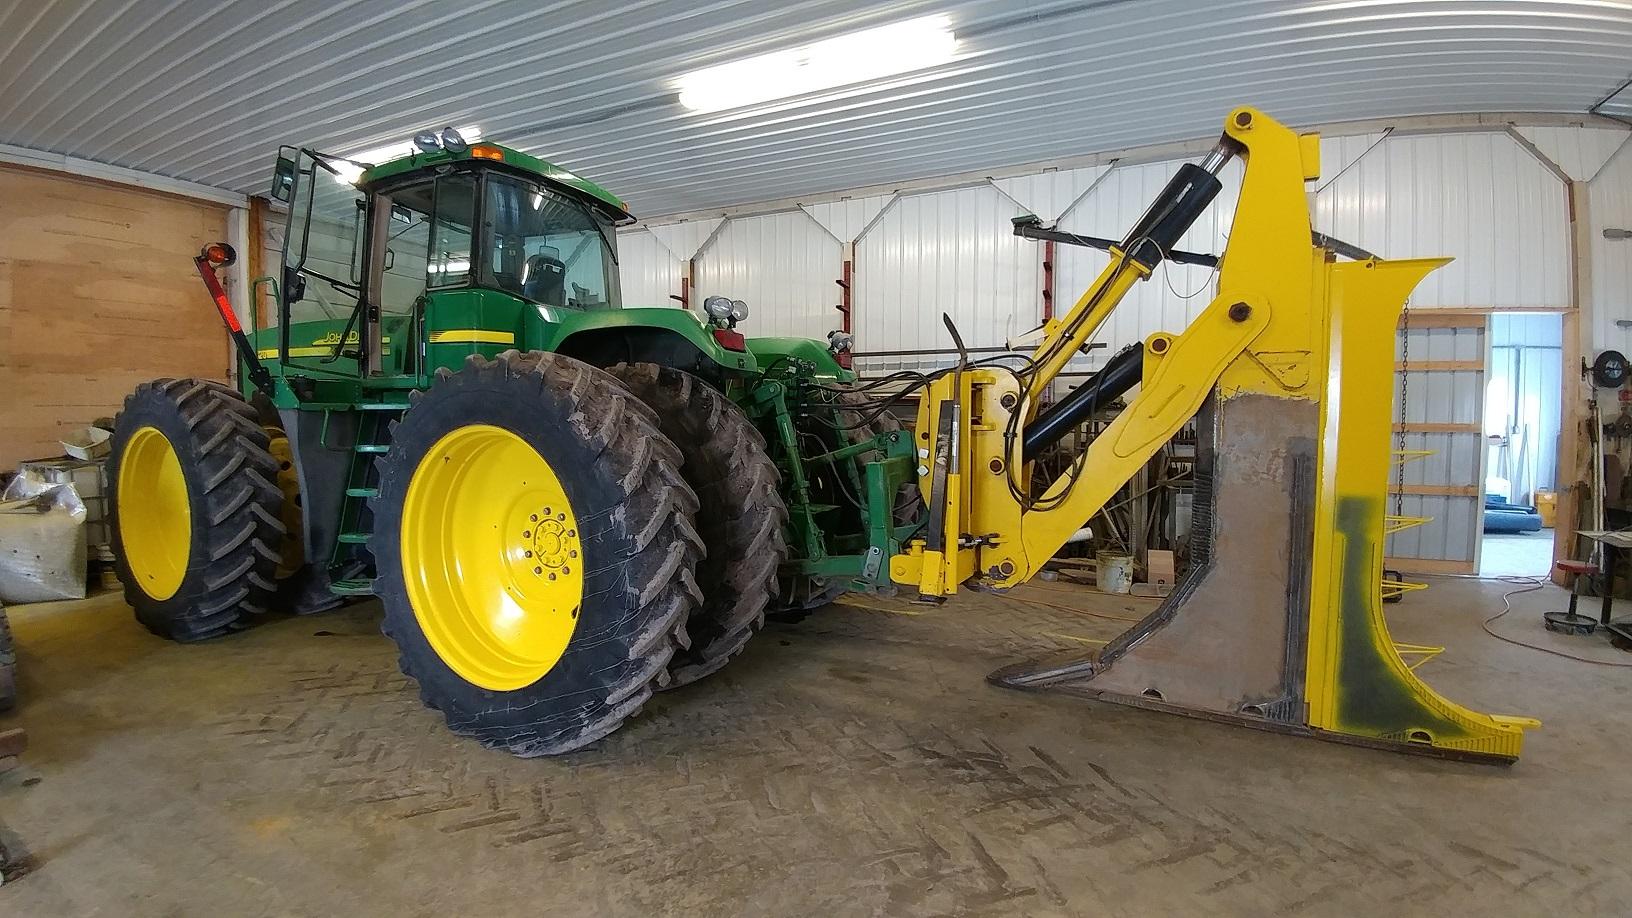 JD9220 with custom built tile plow by Split Pine Farms, Inc.